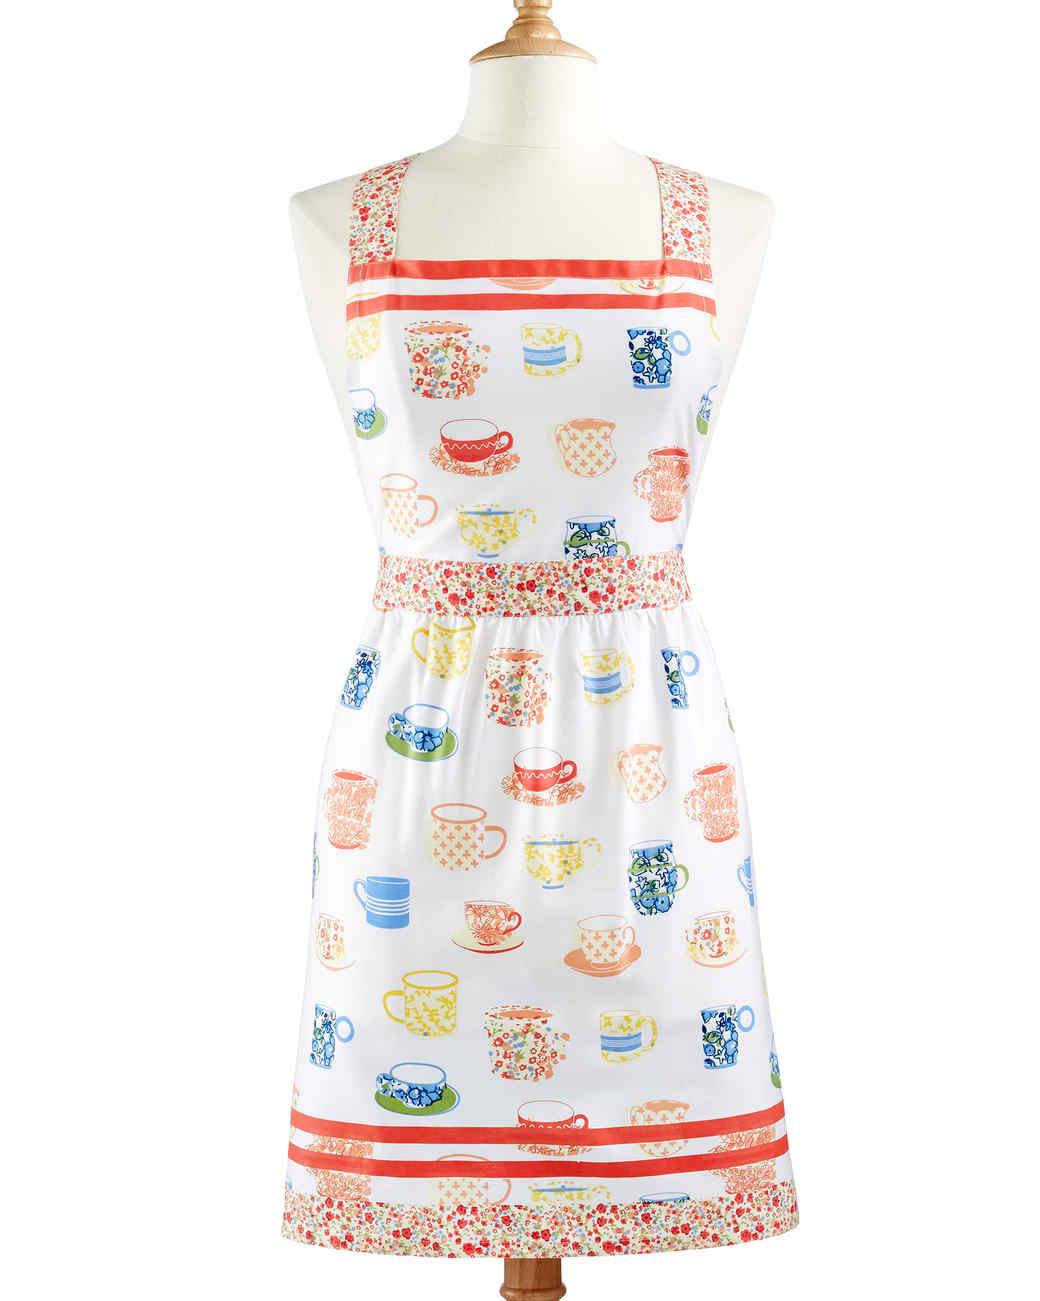 msmacys_giftguides_hostess_apron.jpg